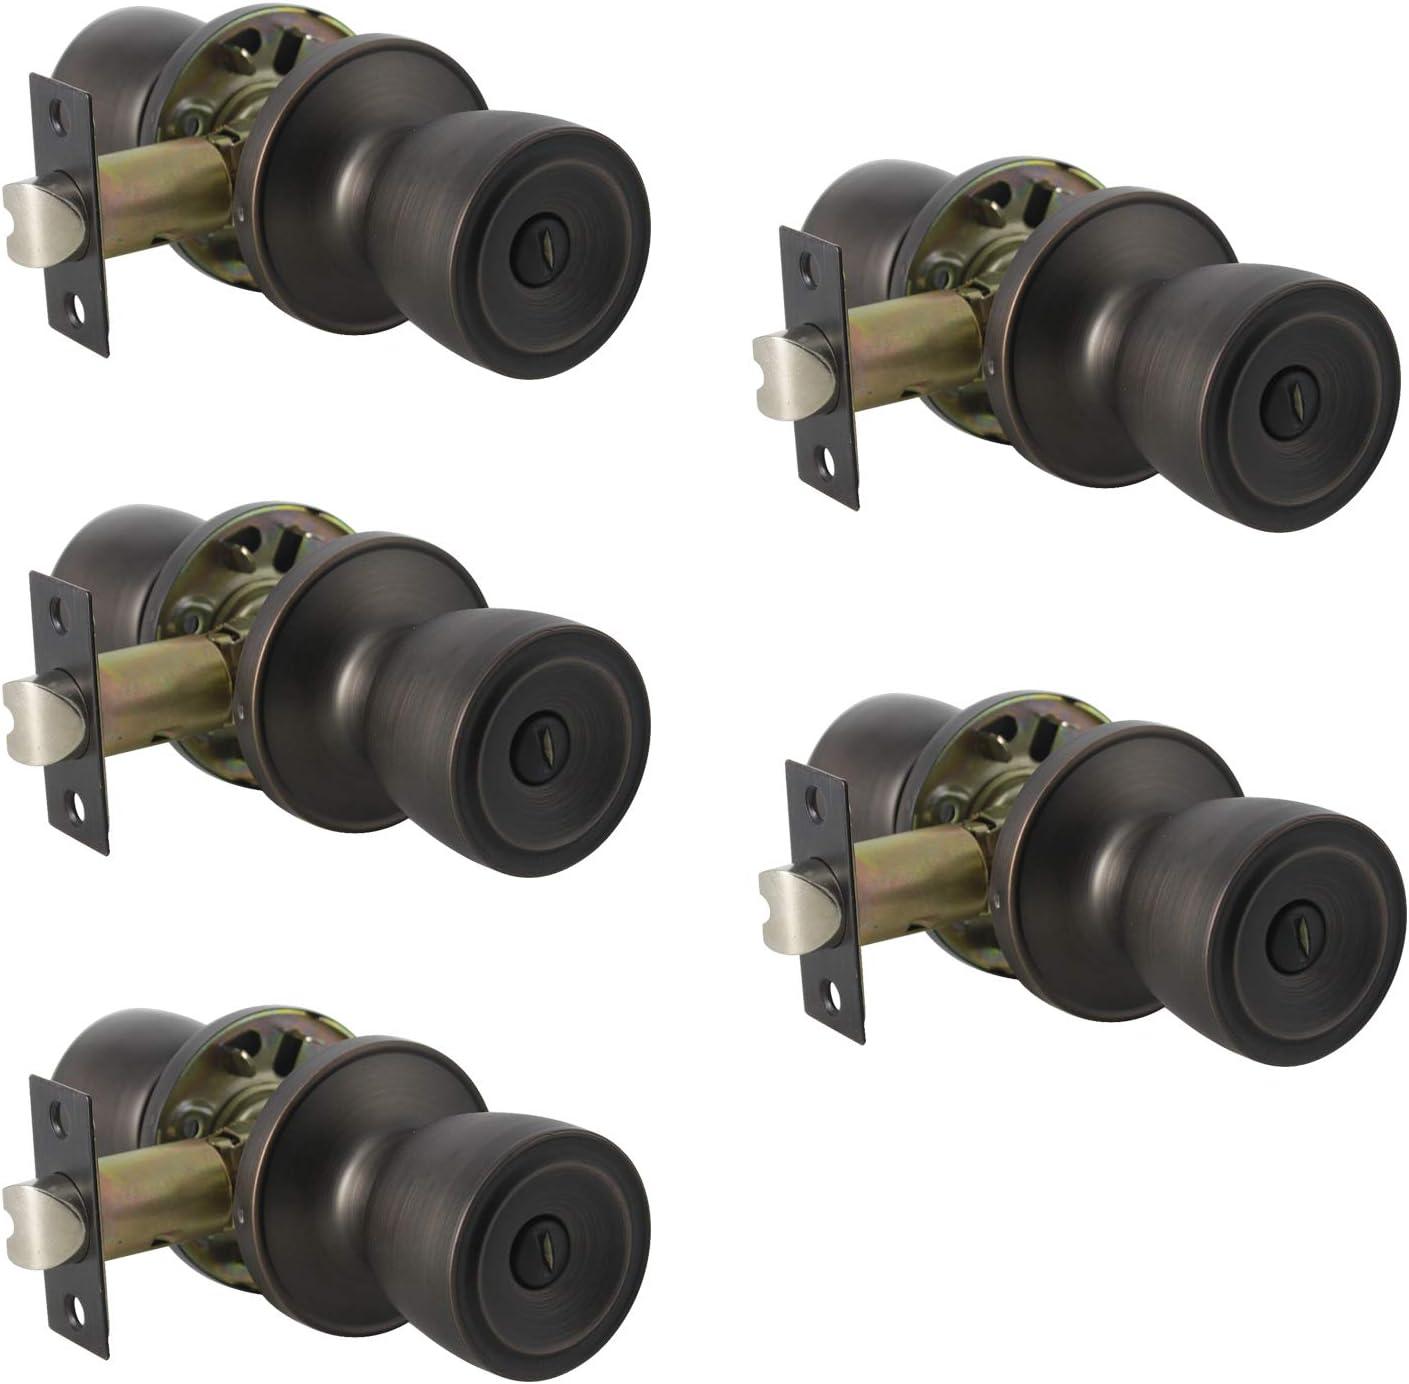 1 Pack Probrico Interior Bathroom Privacy Keyless Doorknobs Door Lock Lockset 607-ORB-BK in Oil Rubbed Bronze